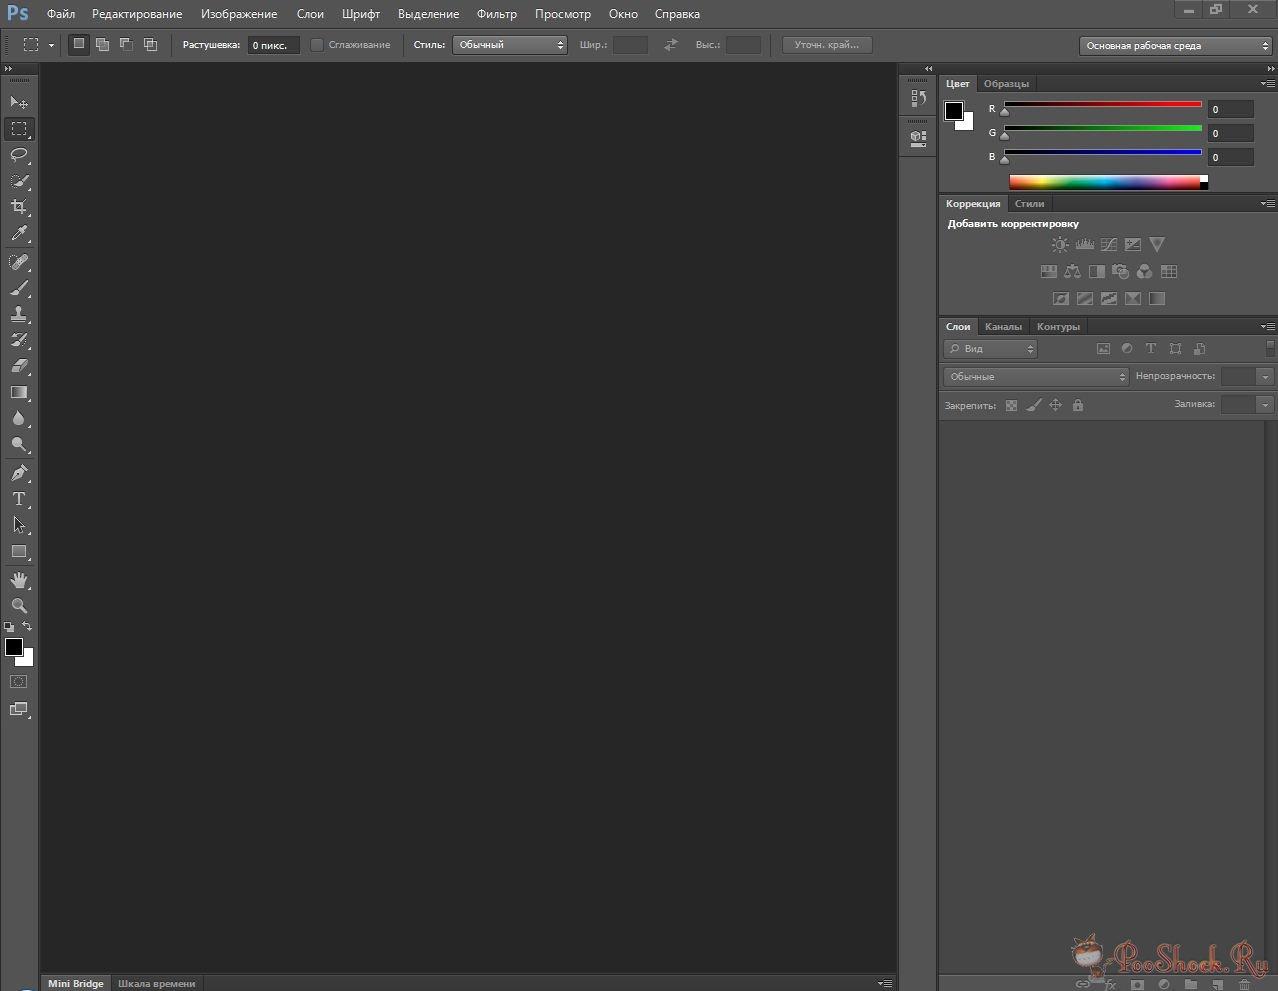 Adobe Media Encoder Cs6 Скачать Крякнутую